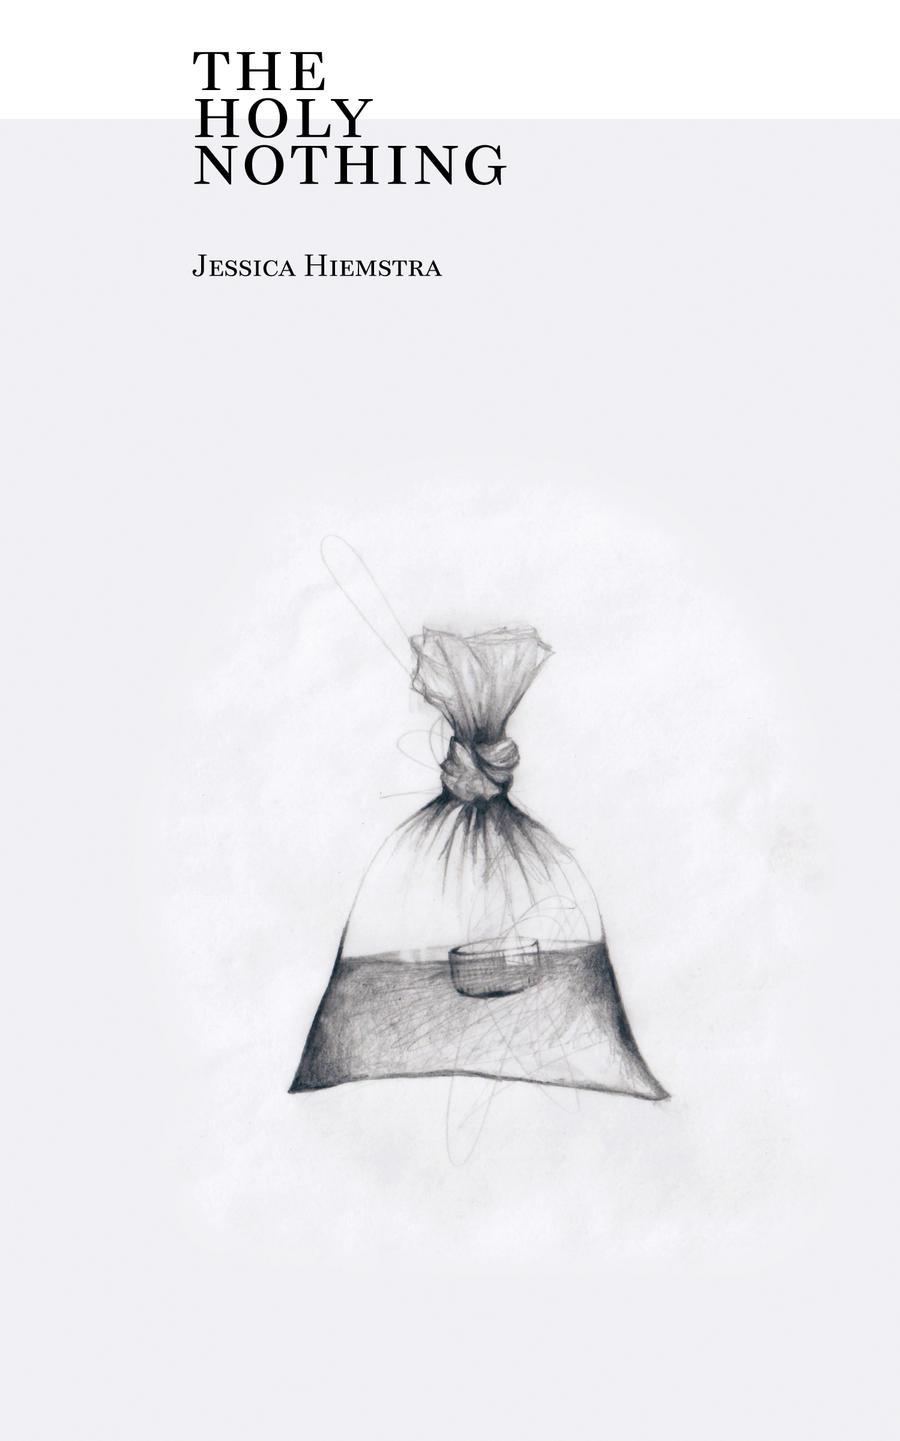 holy-nothing-poetry-book-cover-bottlecap-petfish.jpg